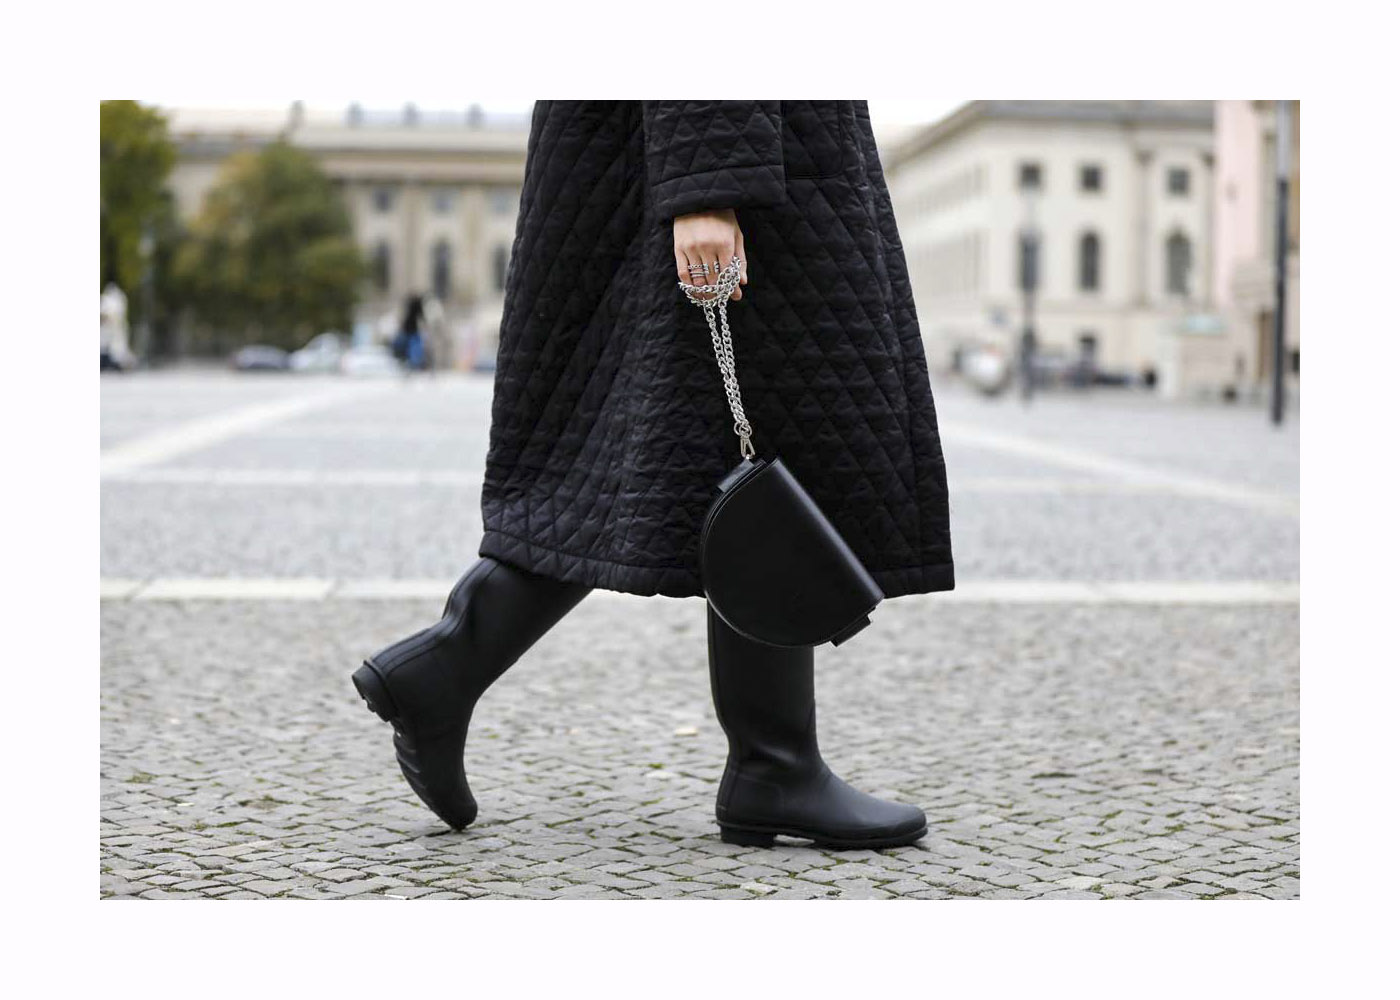 Jacqueline Zelwis Street Style Shooting In Berlin